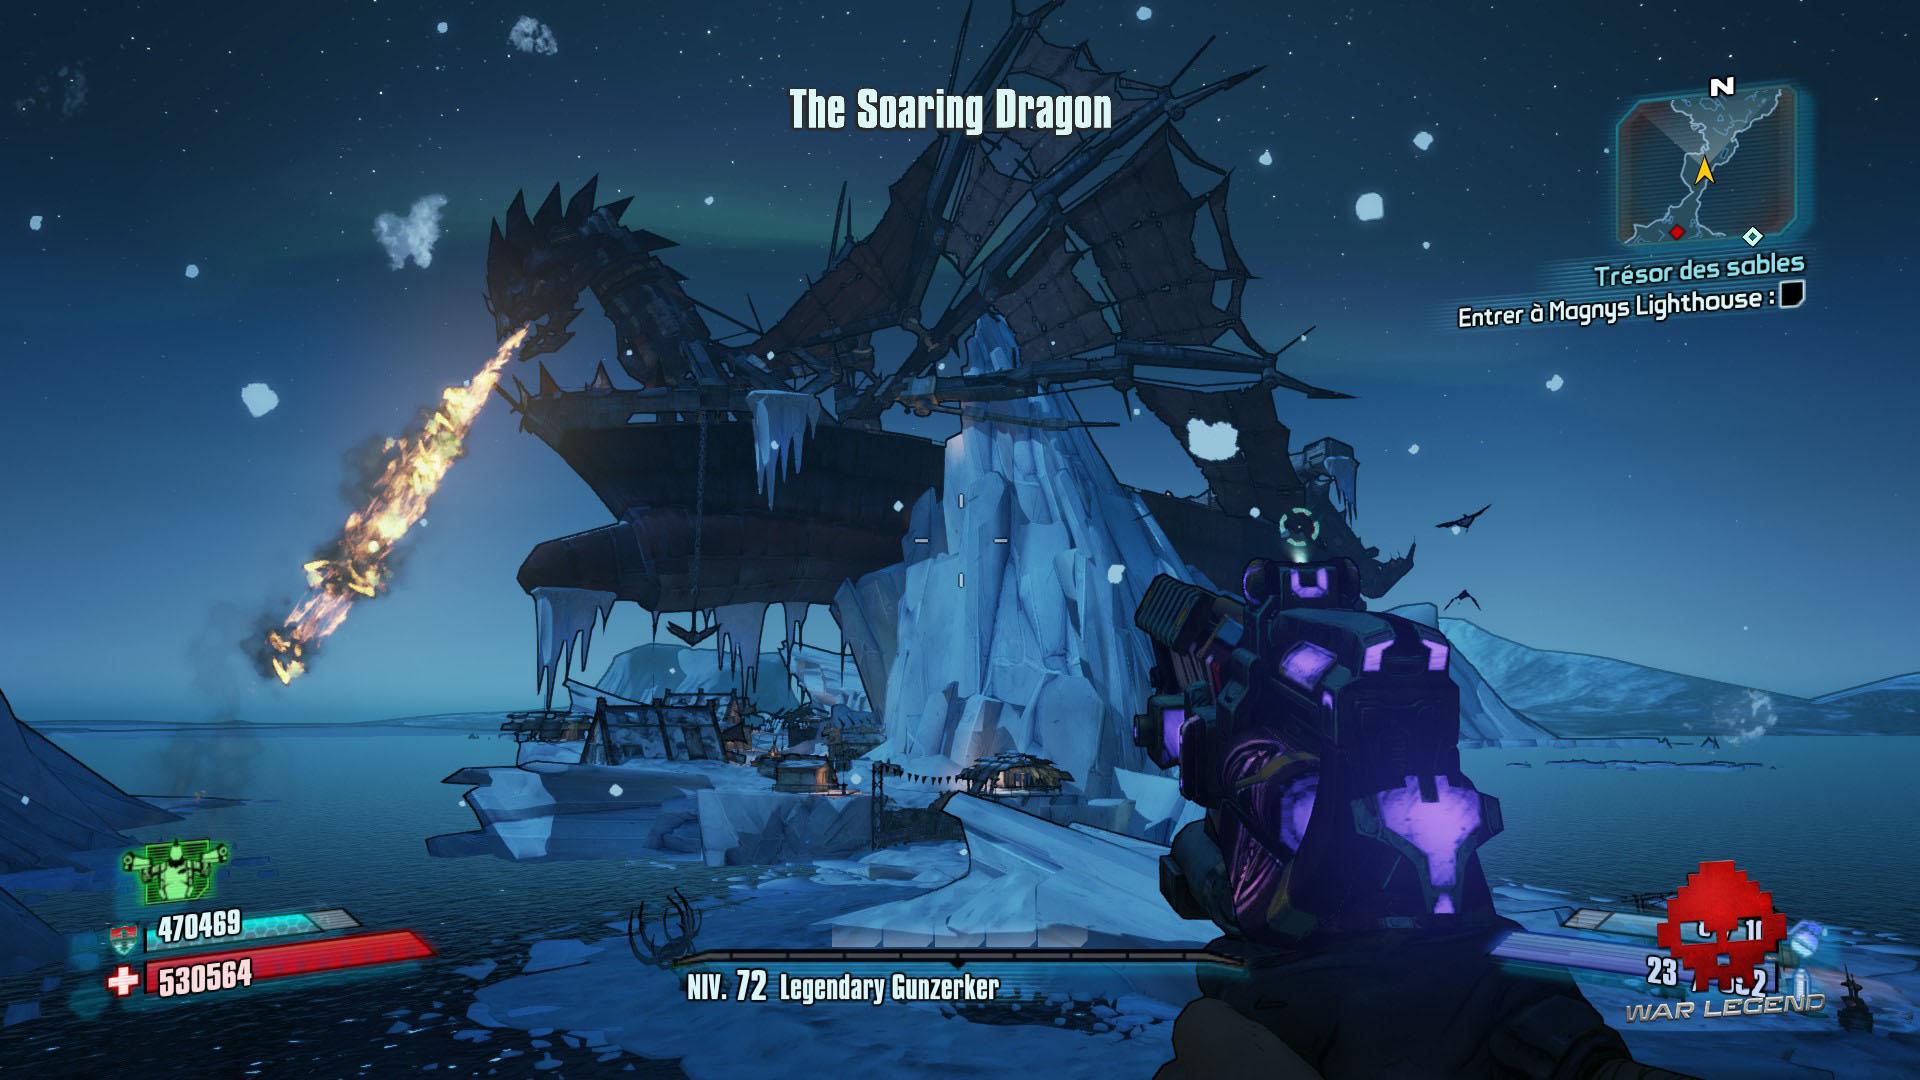 Guide borderlands 2 le soaring dragon